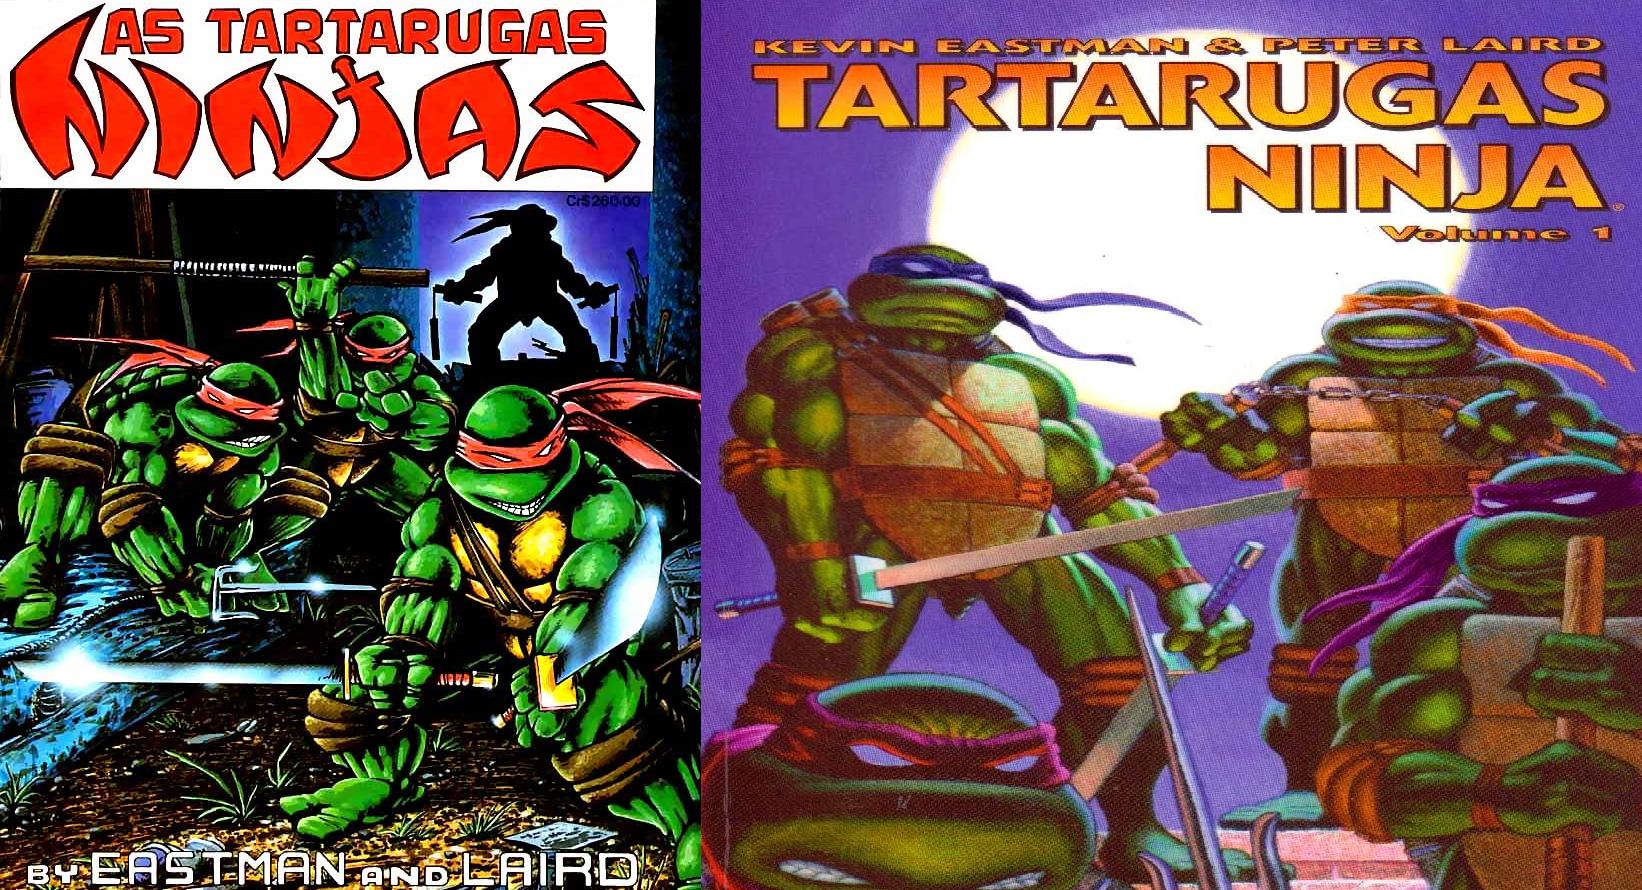 Cowabunga A Trajetoria Das Tartarugas Ninja Nos Quadrinhos